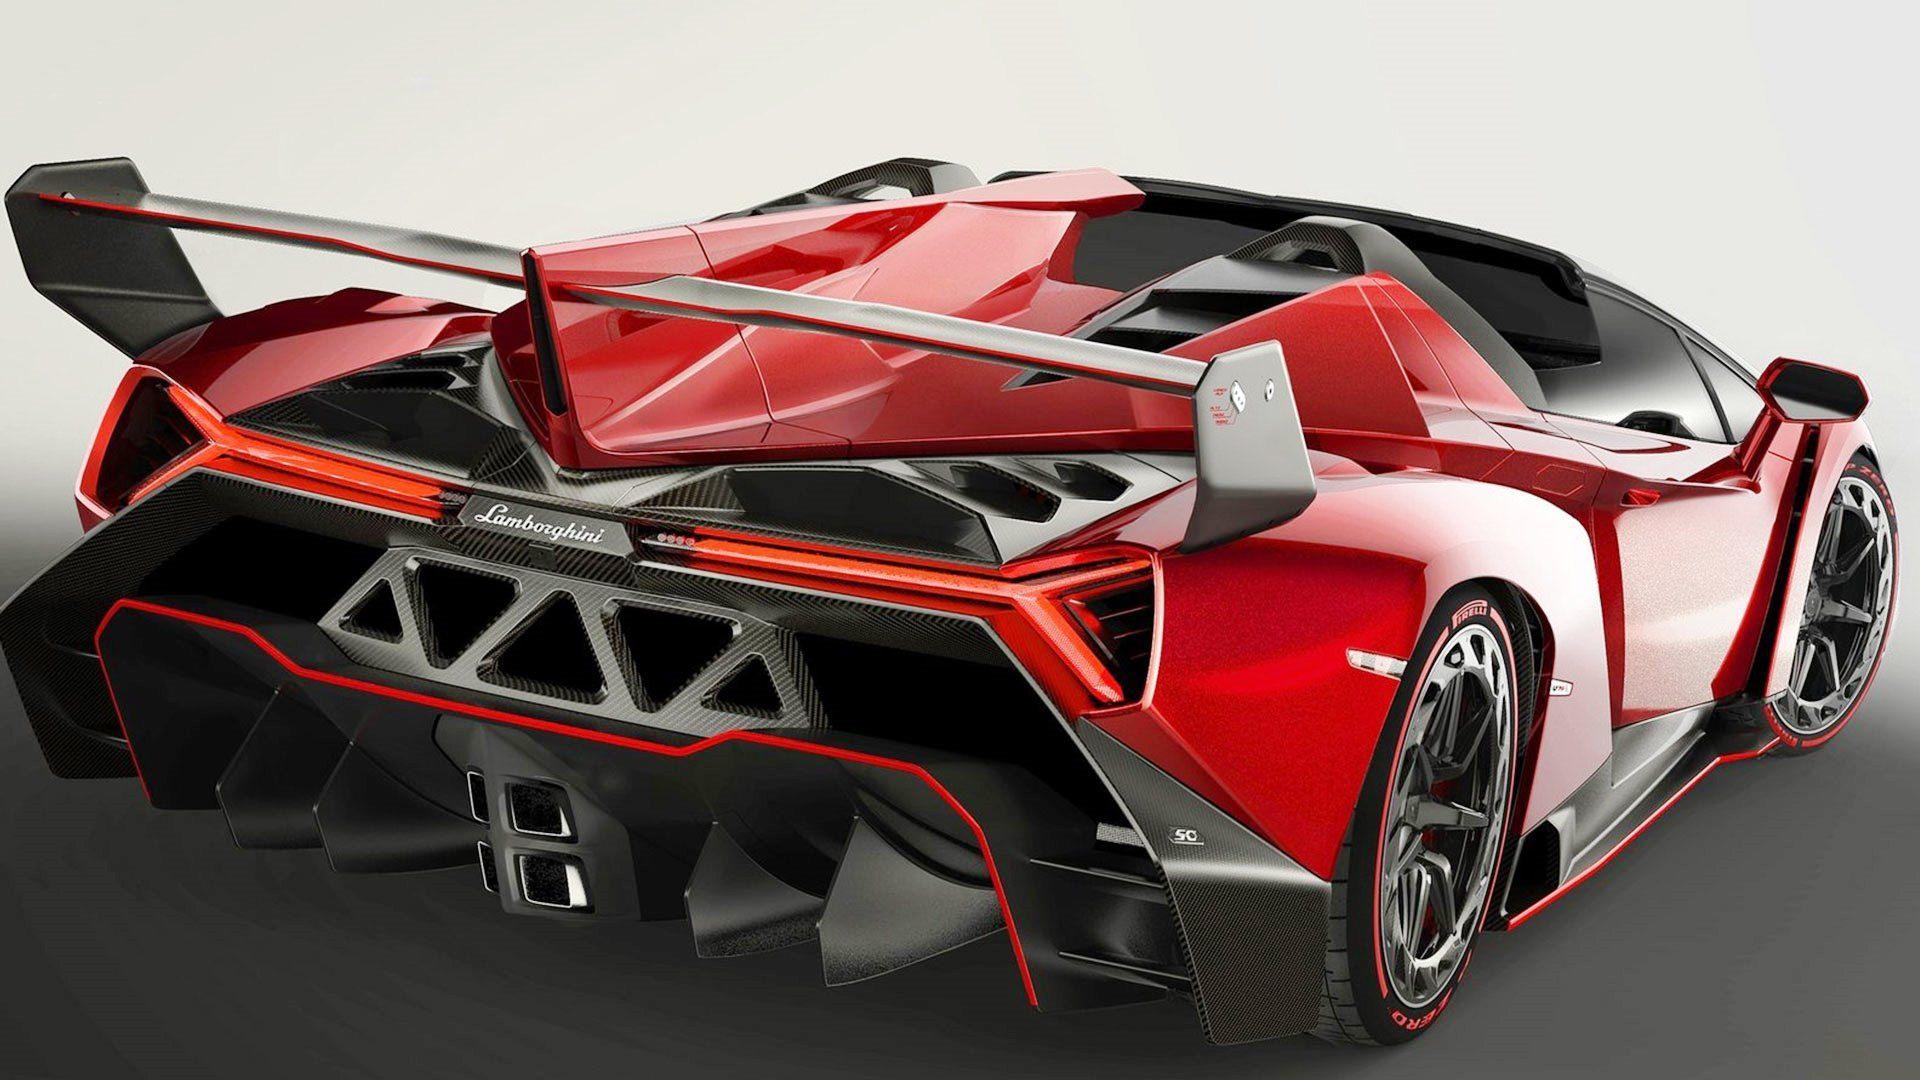 Superbe Lamborghini Veneno Back View Red Sport Cars Hd Wallpaper